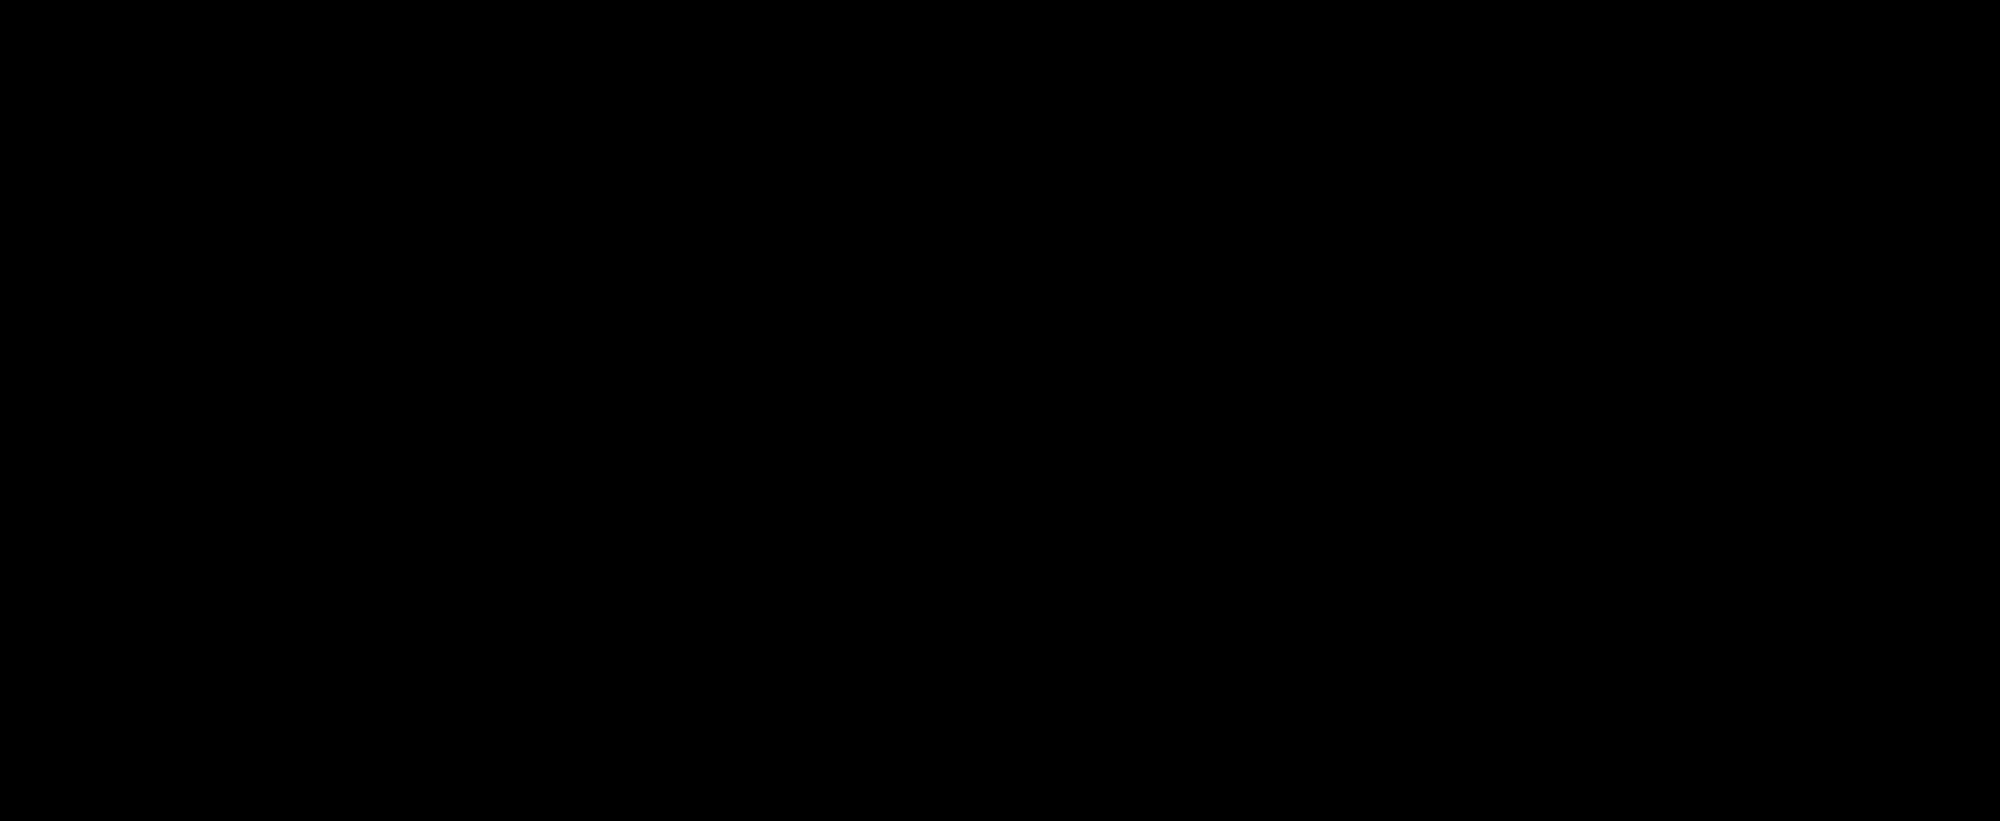 HBO-Logo-Wallpaper_-_Hi_Res_(2).png